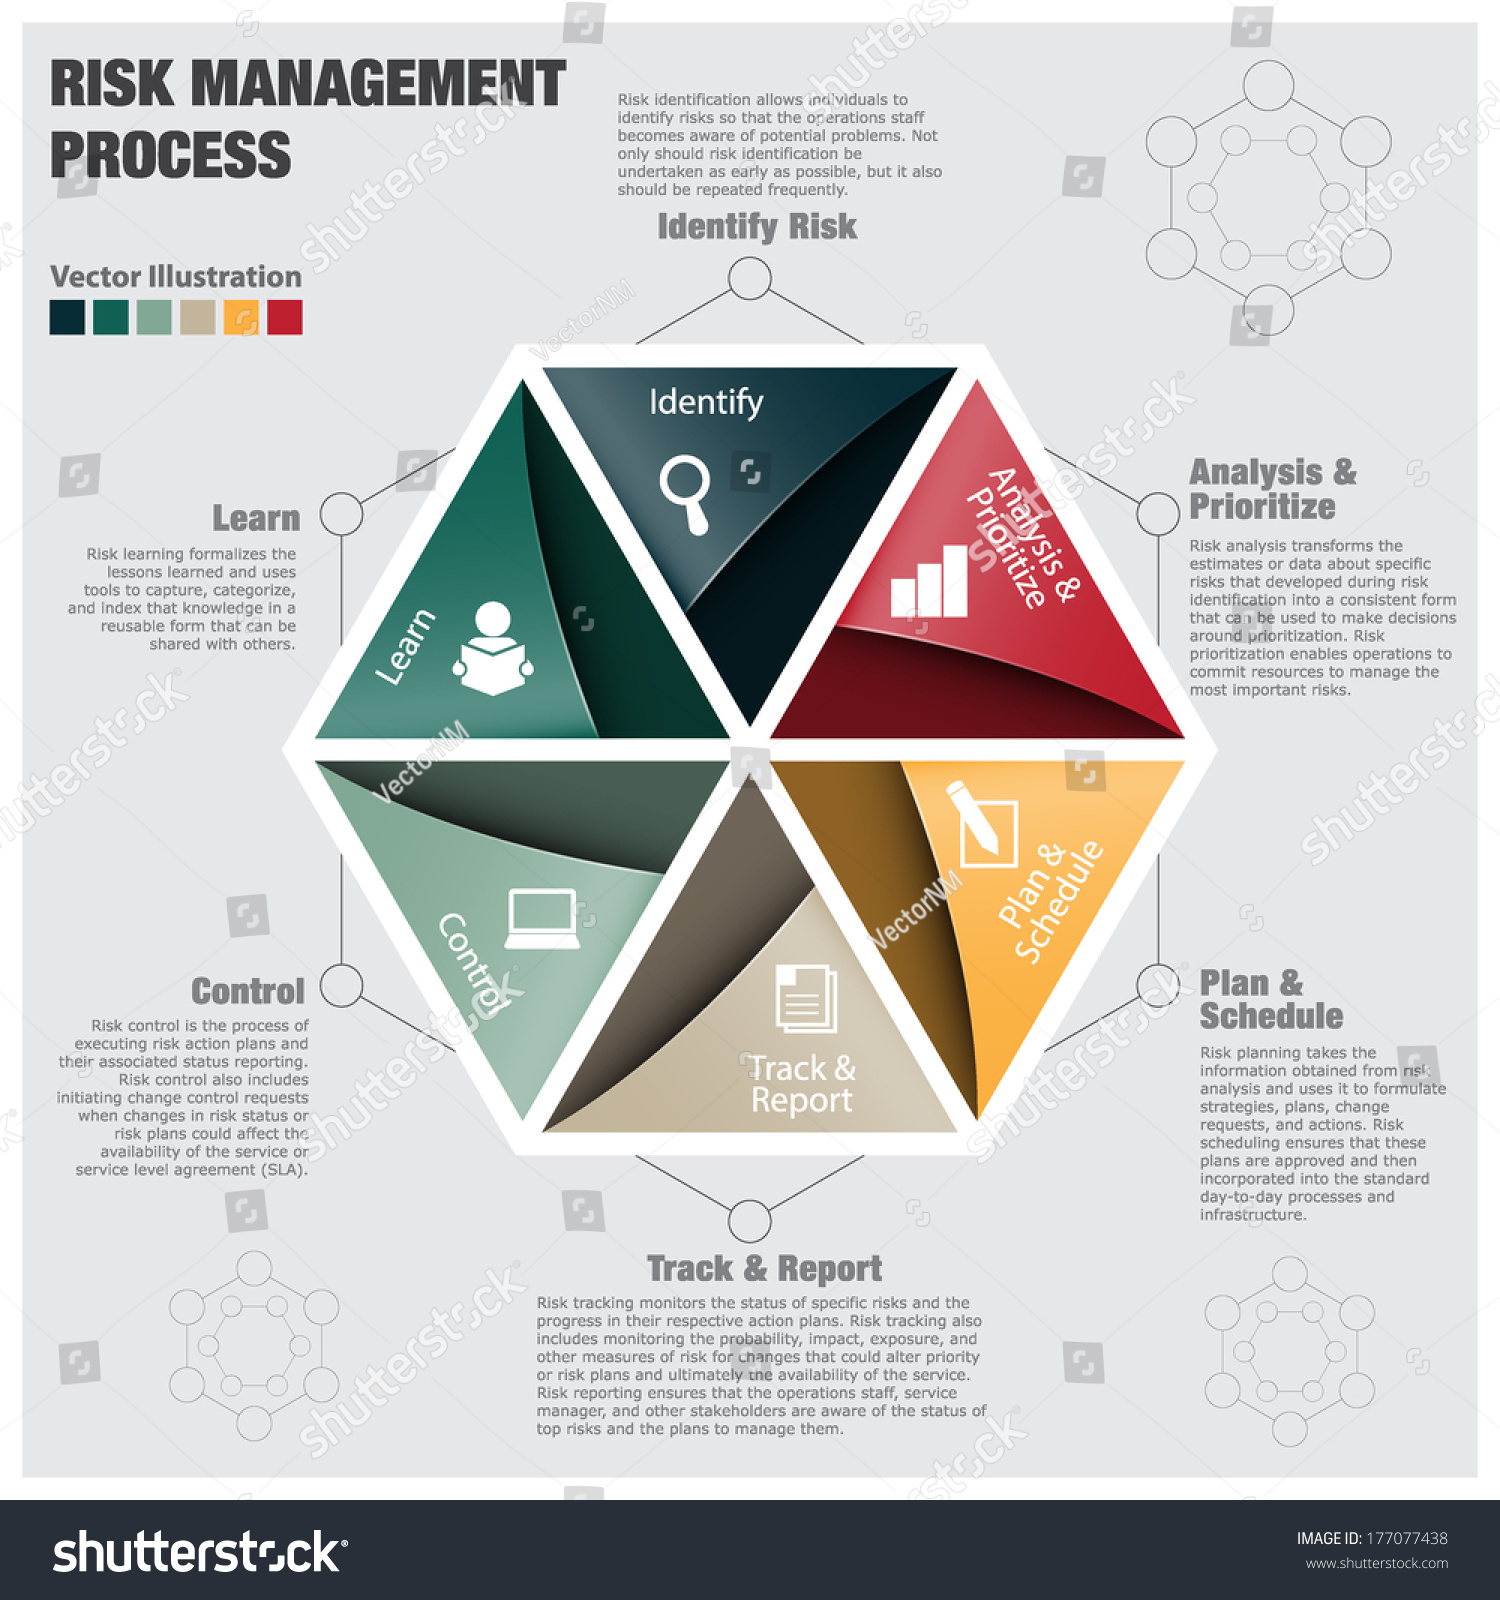 Risk management process diagram vector illustration stock vector risk management process diagram vector illustration pooptronica